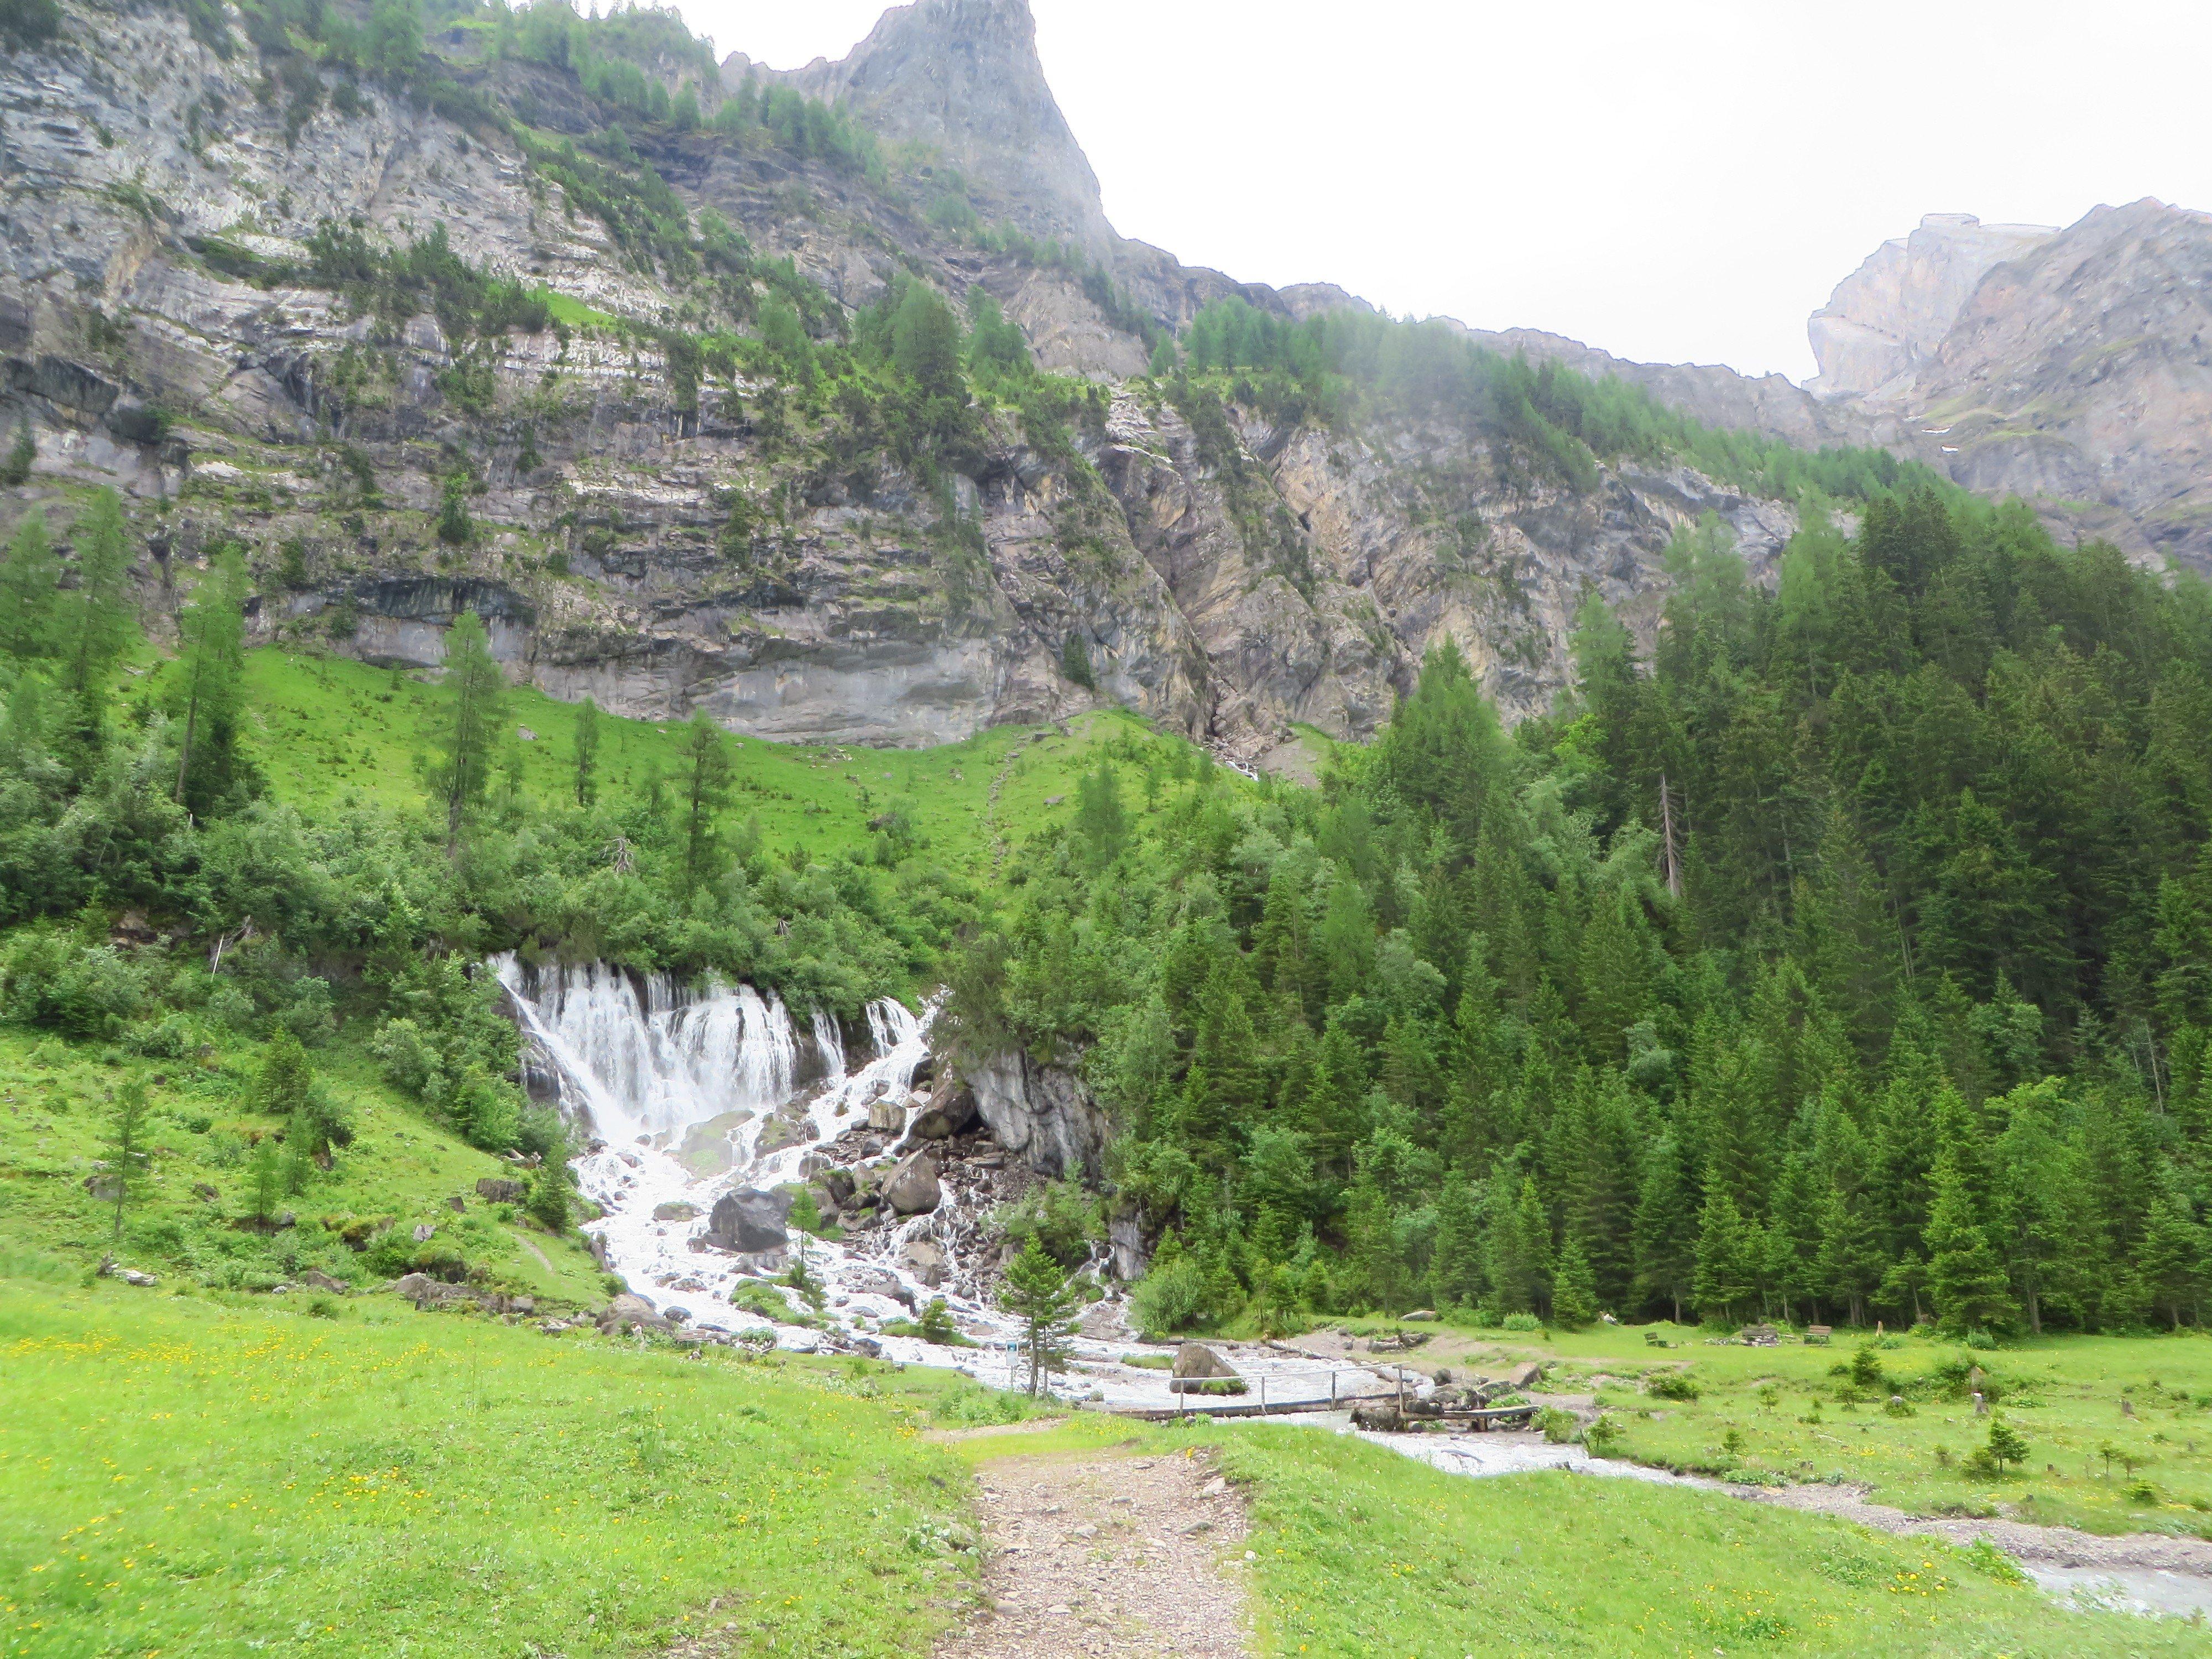 Wallpaper 4000x3000 Px Bernese Alps Green Mountains